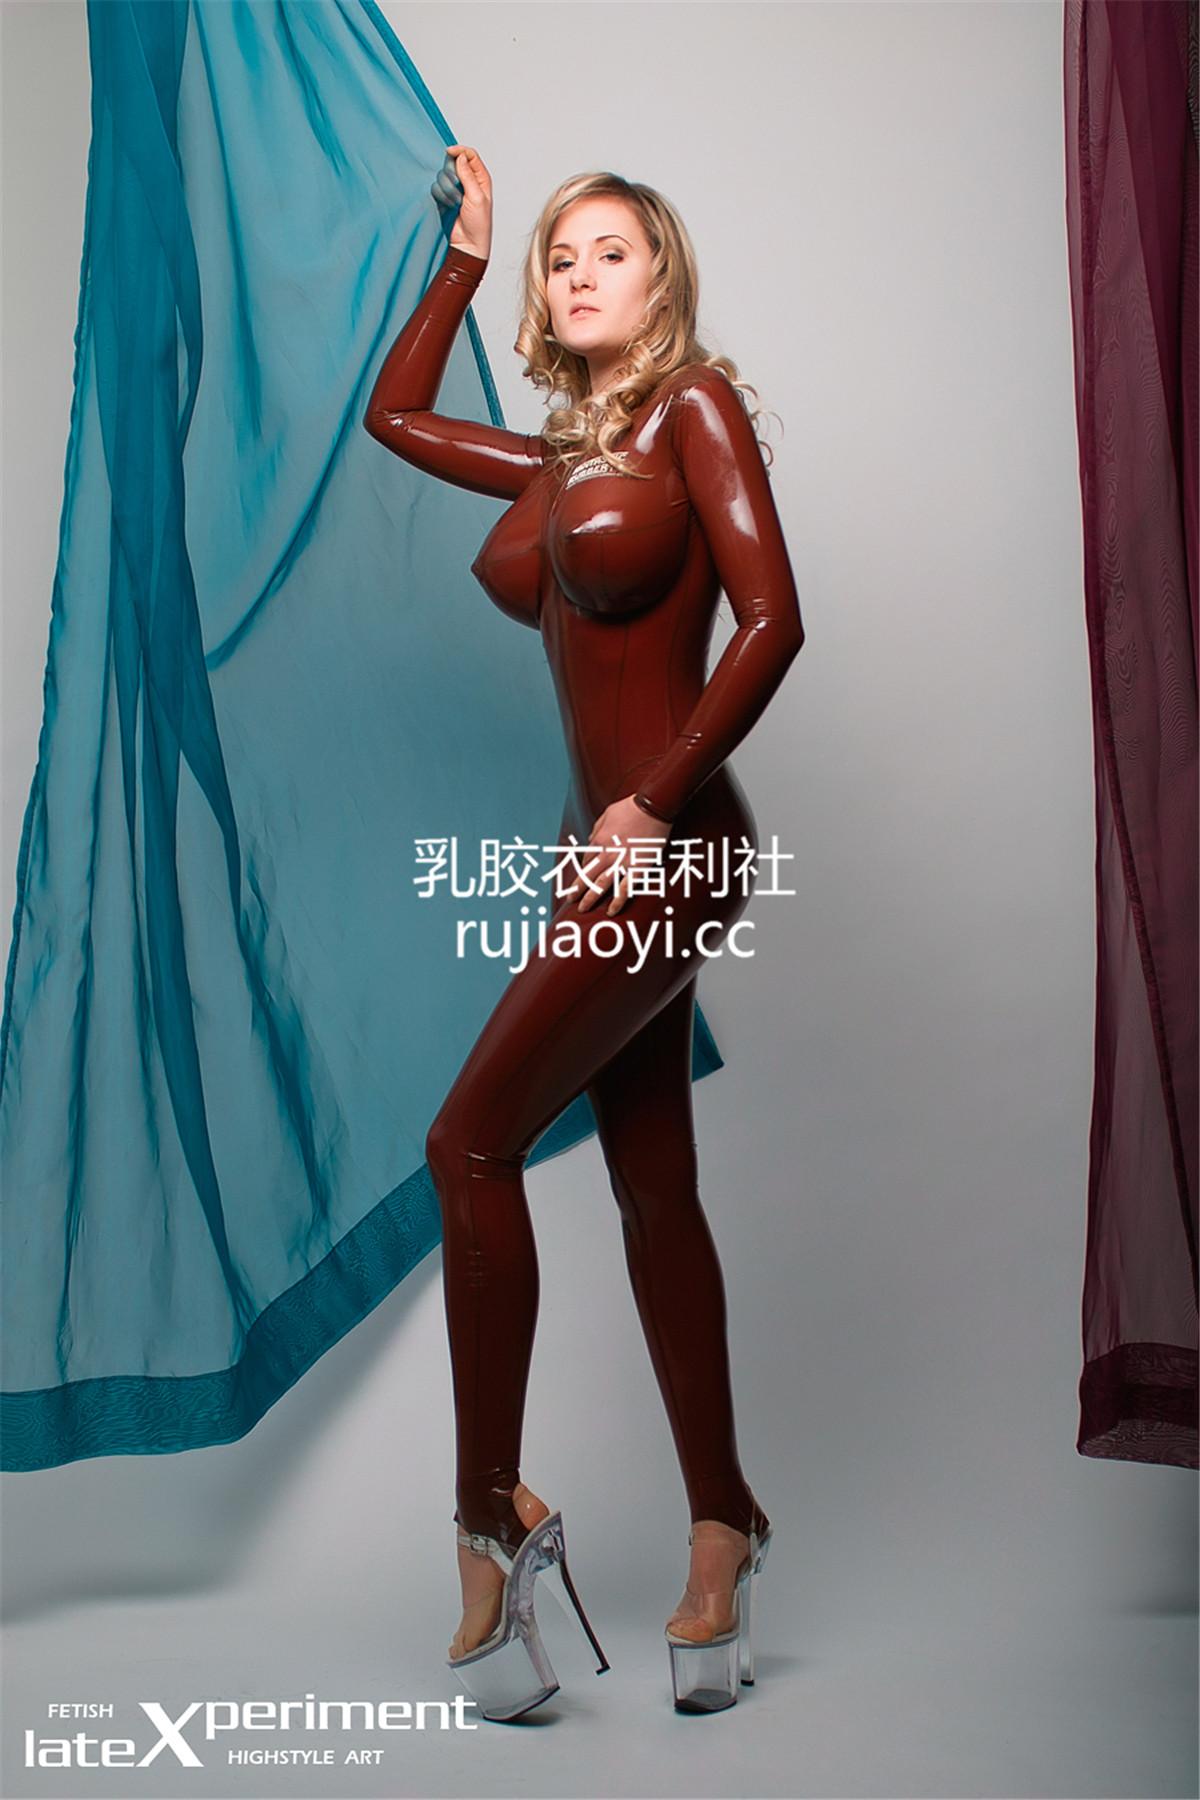 [LateXperiment] 性感乳胶衣美人高挑凸点搔首弄姿迷人有型